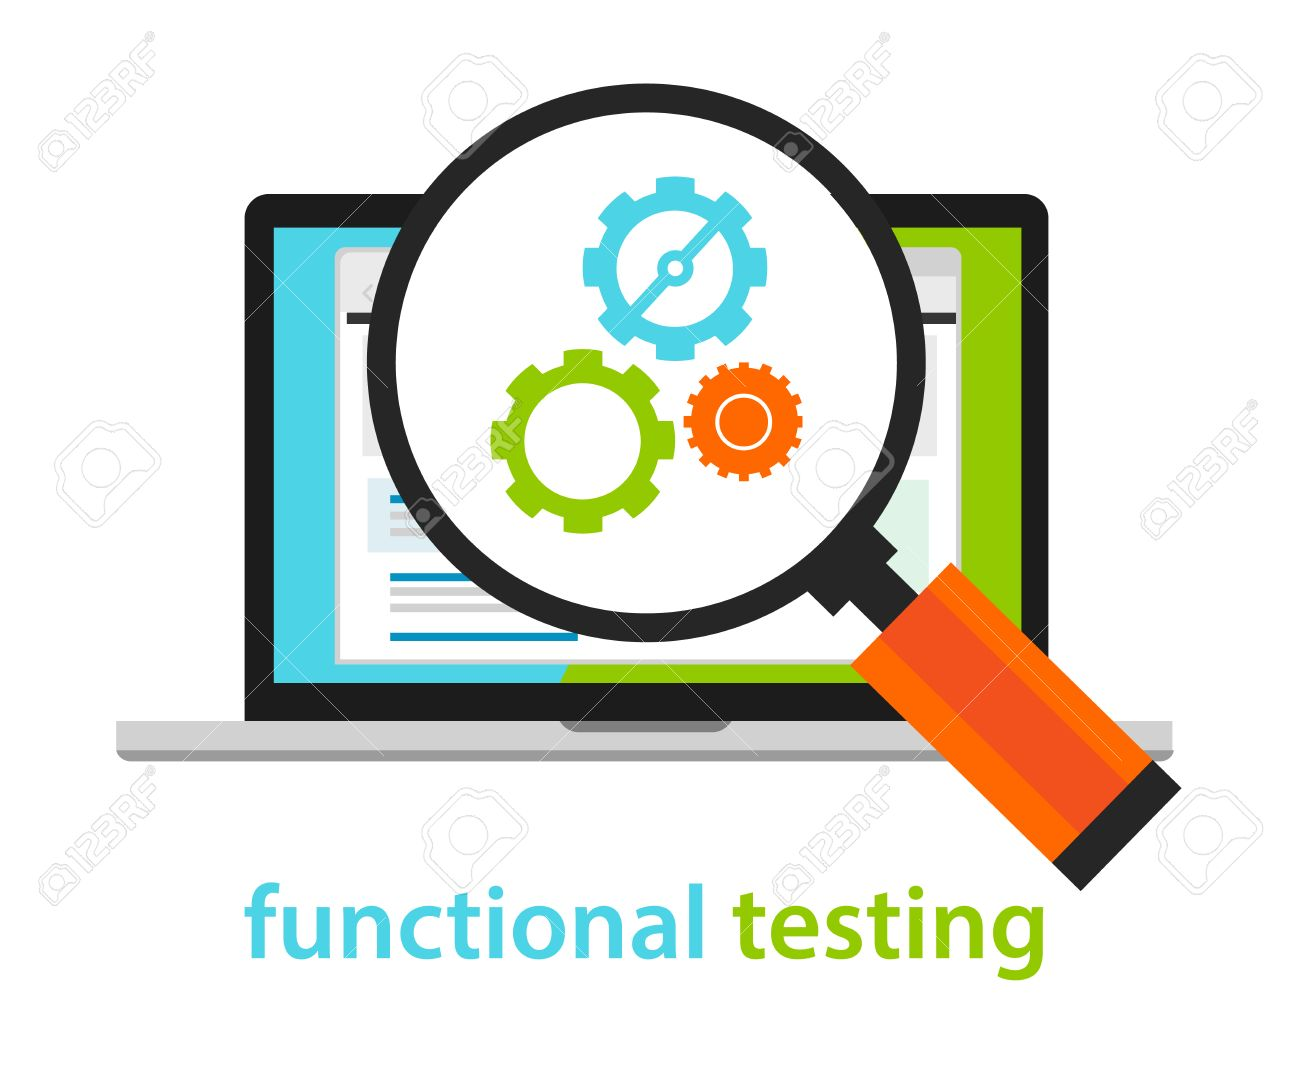 functional testing software development process methodology - 53969365